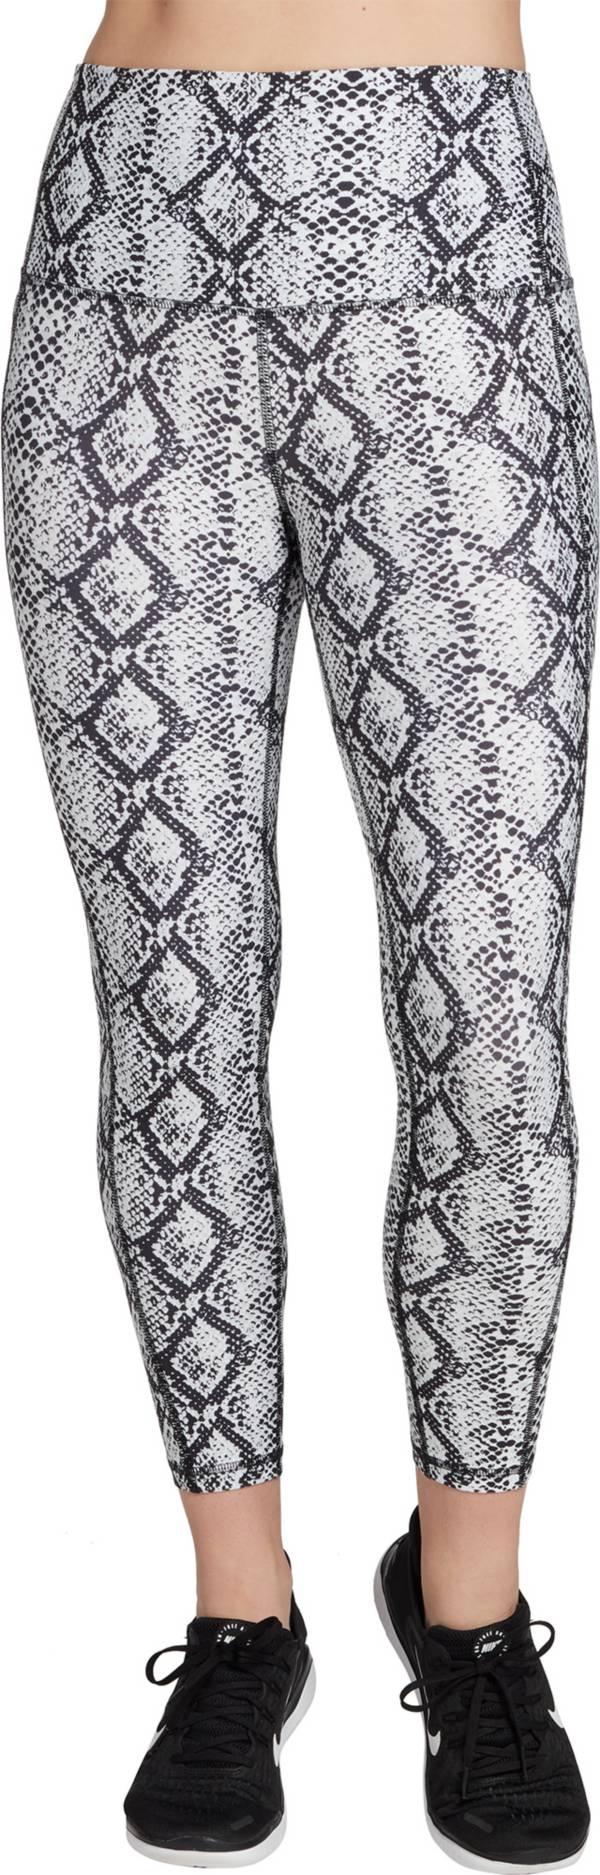 DSG Women's Performance Ultra High Rise Leggings product image